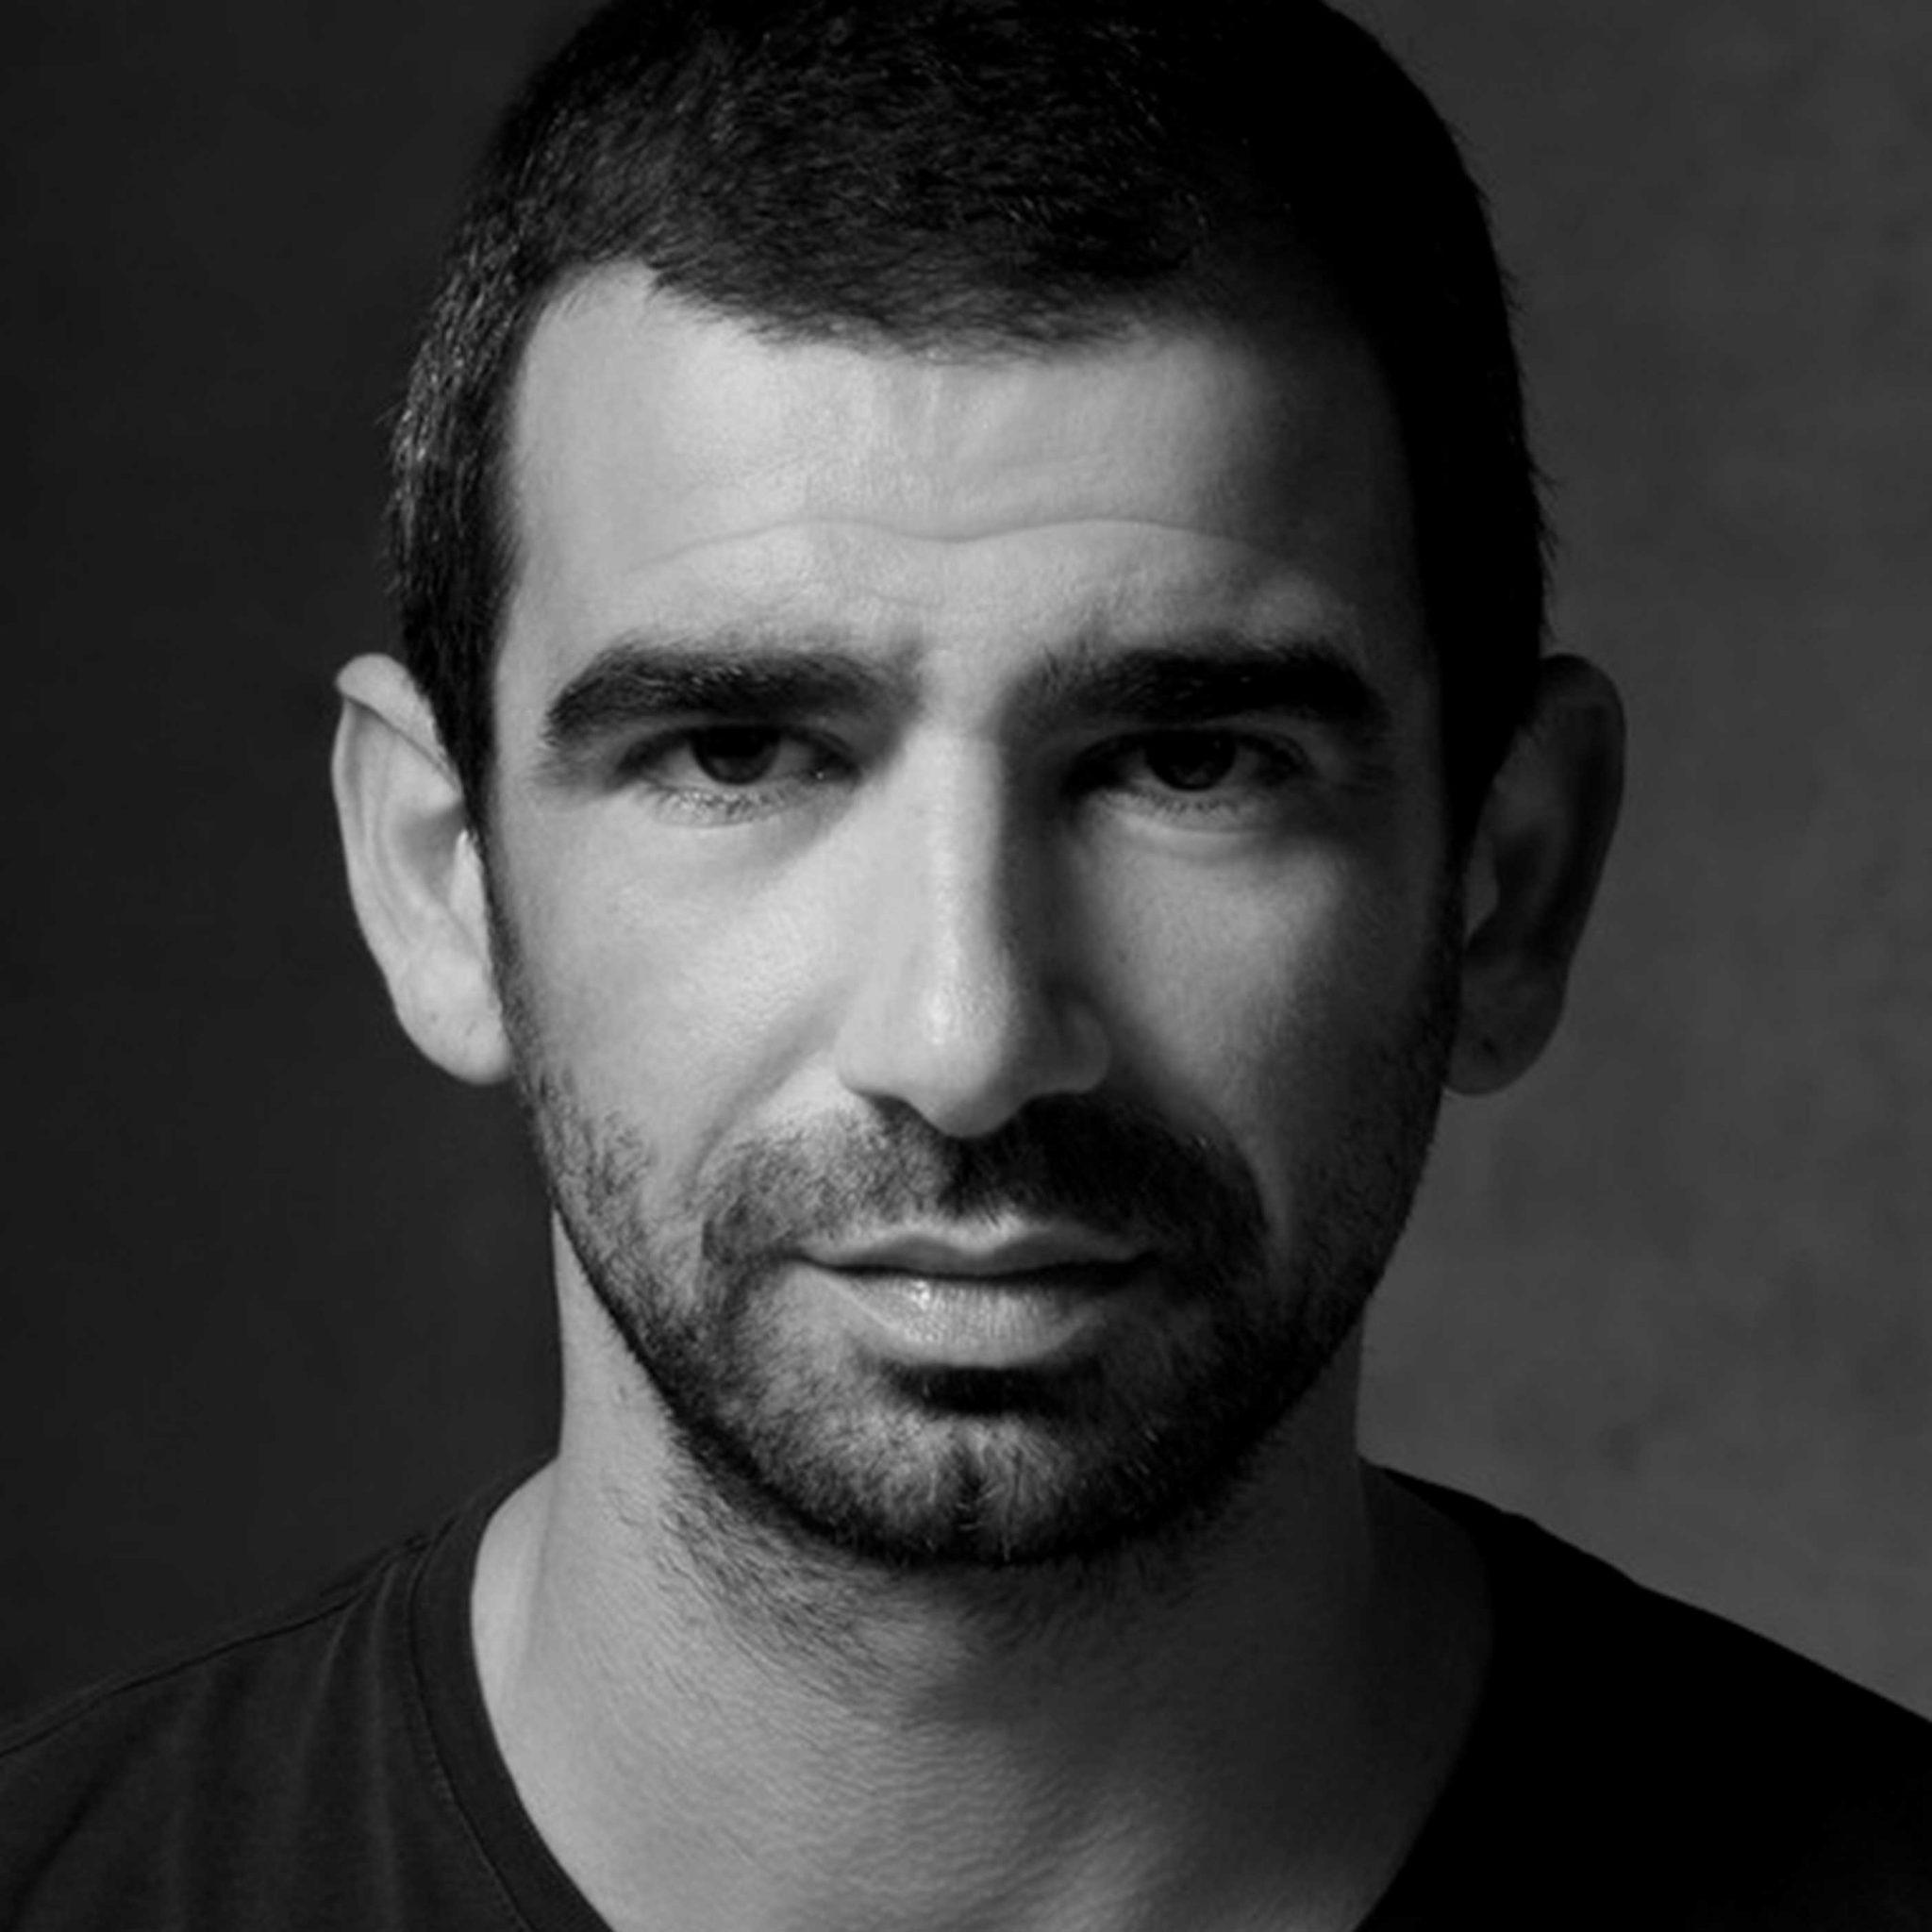 David Pereira Bastos